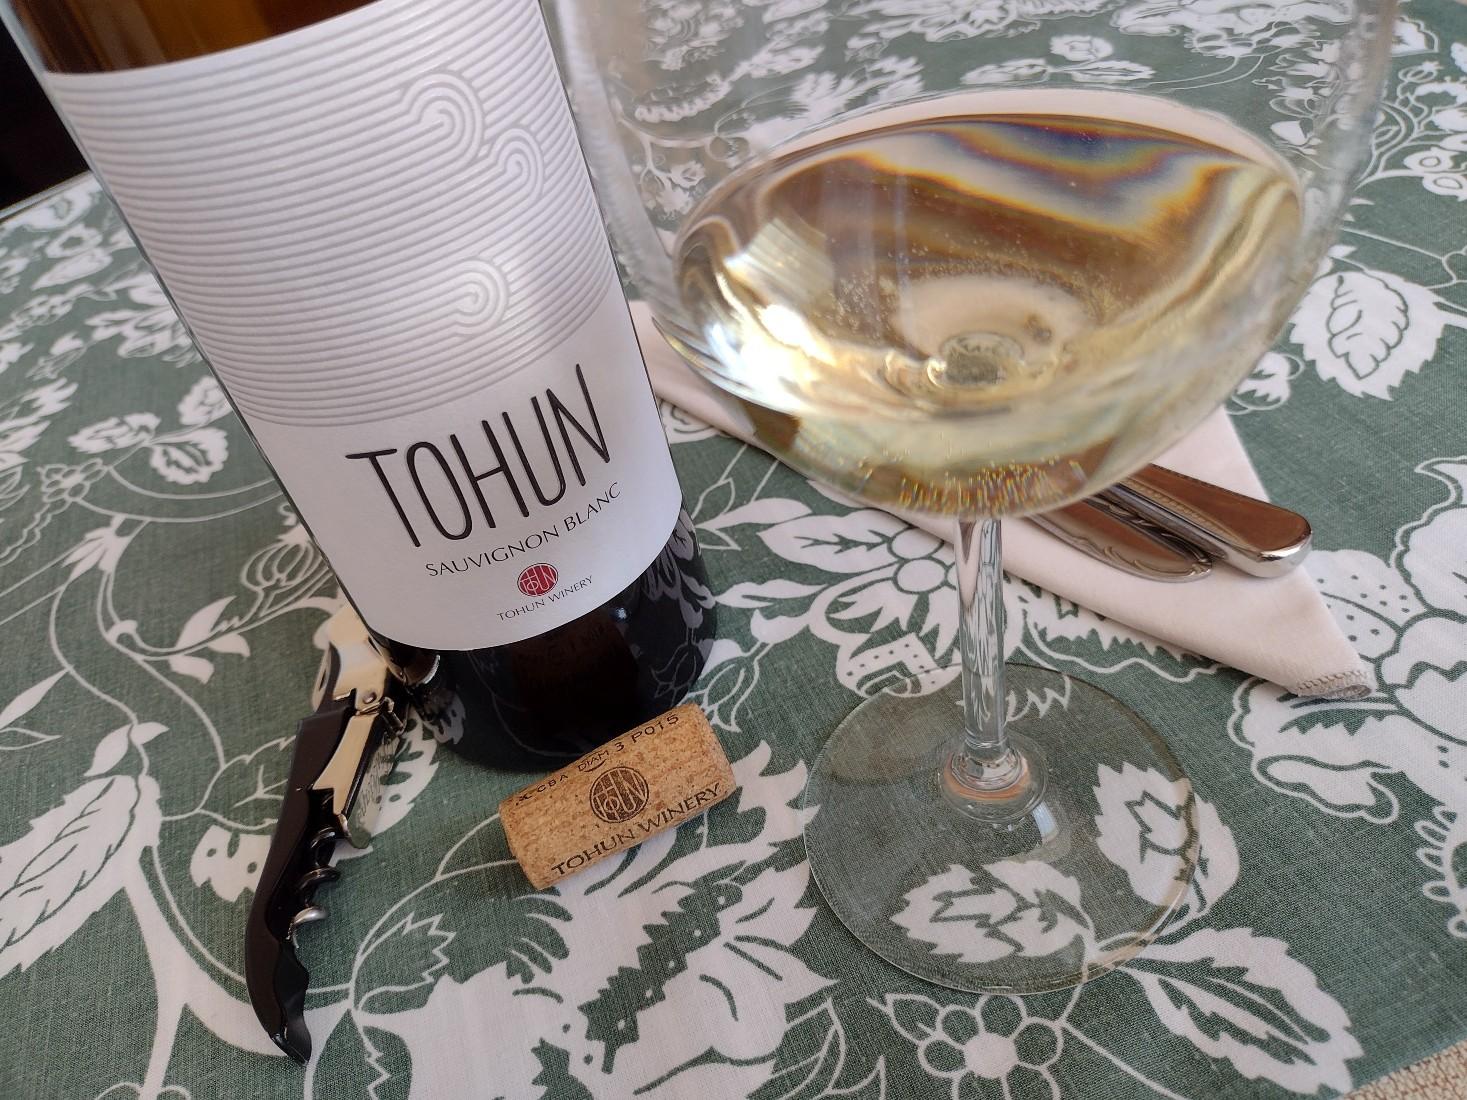 Tohin Sauvignon Blanc 2020 – Tohun Winery